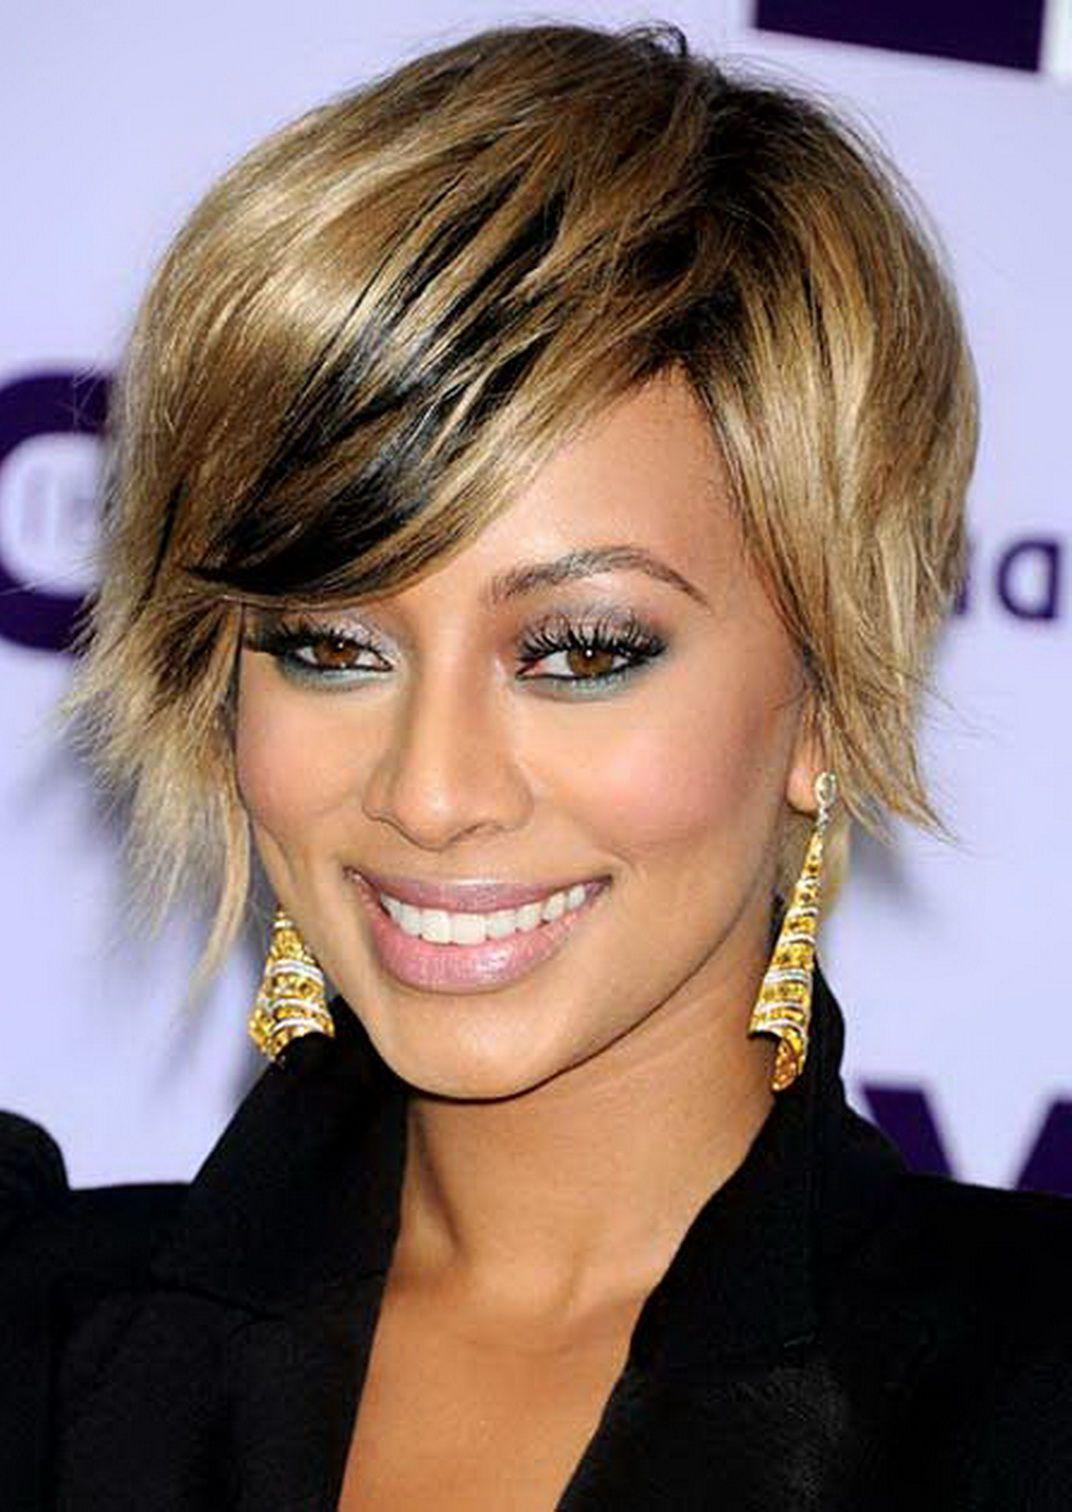 keri hilson short honey blonde and black hairstyle | short